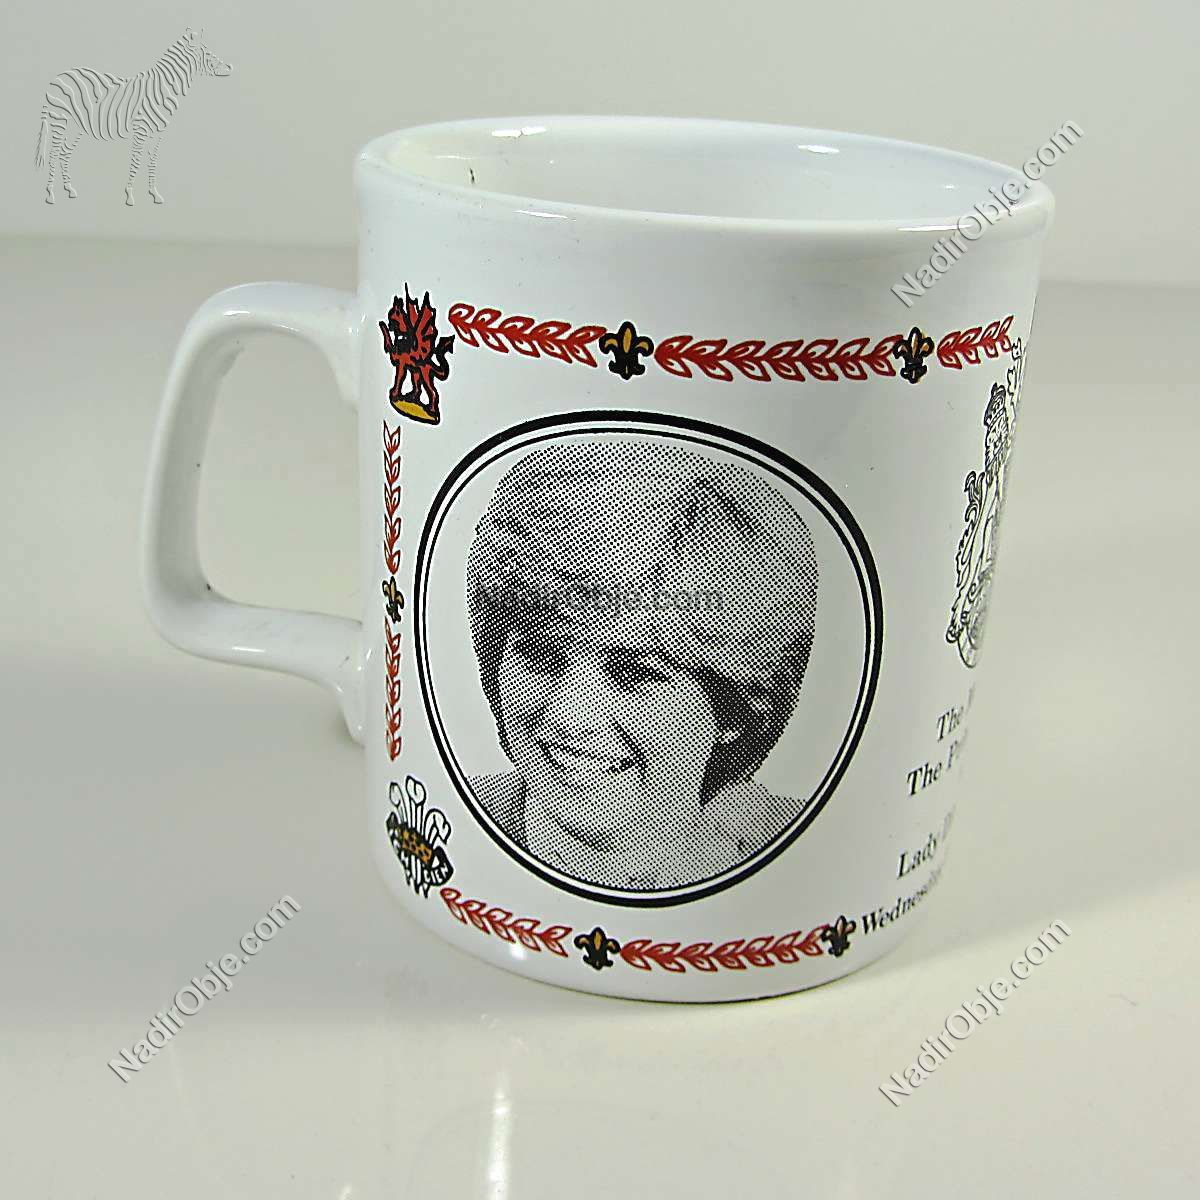 Prenses Diana & Prens Charles Düğün Hatırası Kupa Seramik-Porselen Objeler Bardak